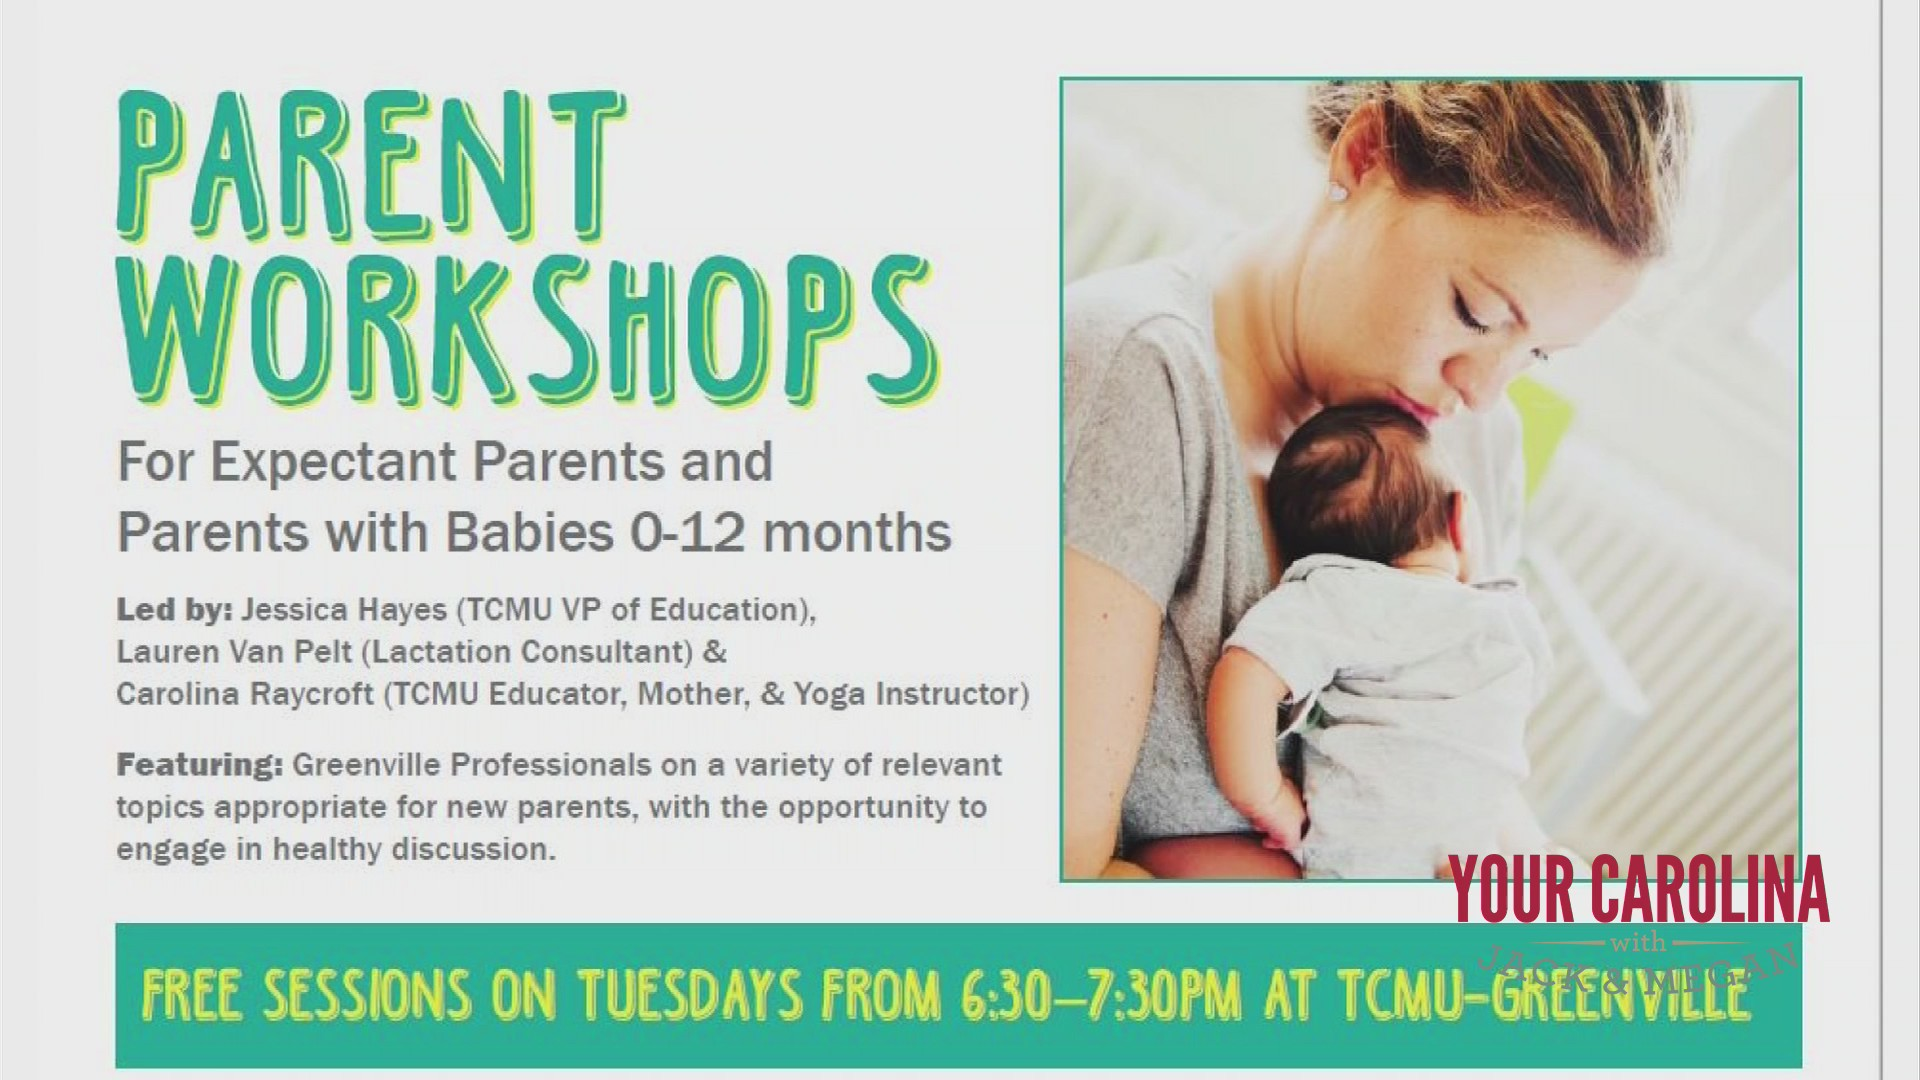 Parent Workshop At The Children's Museum